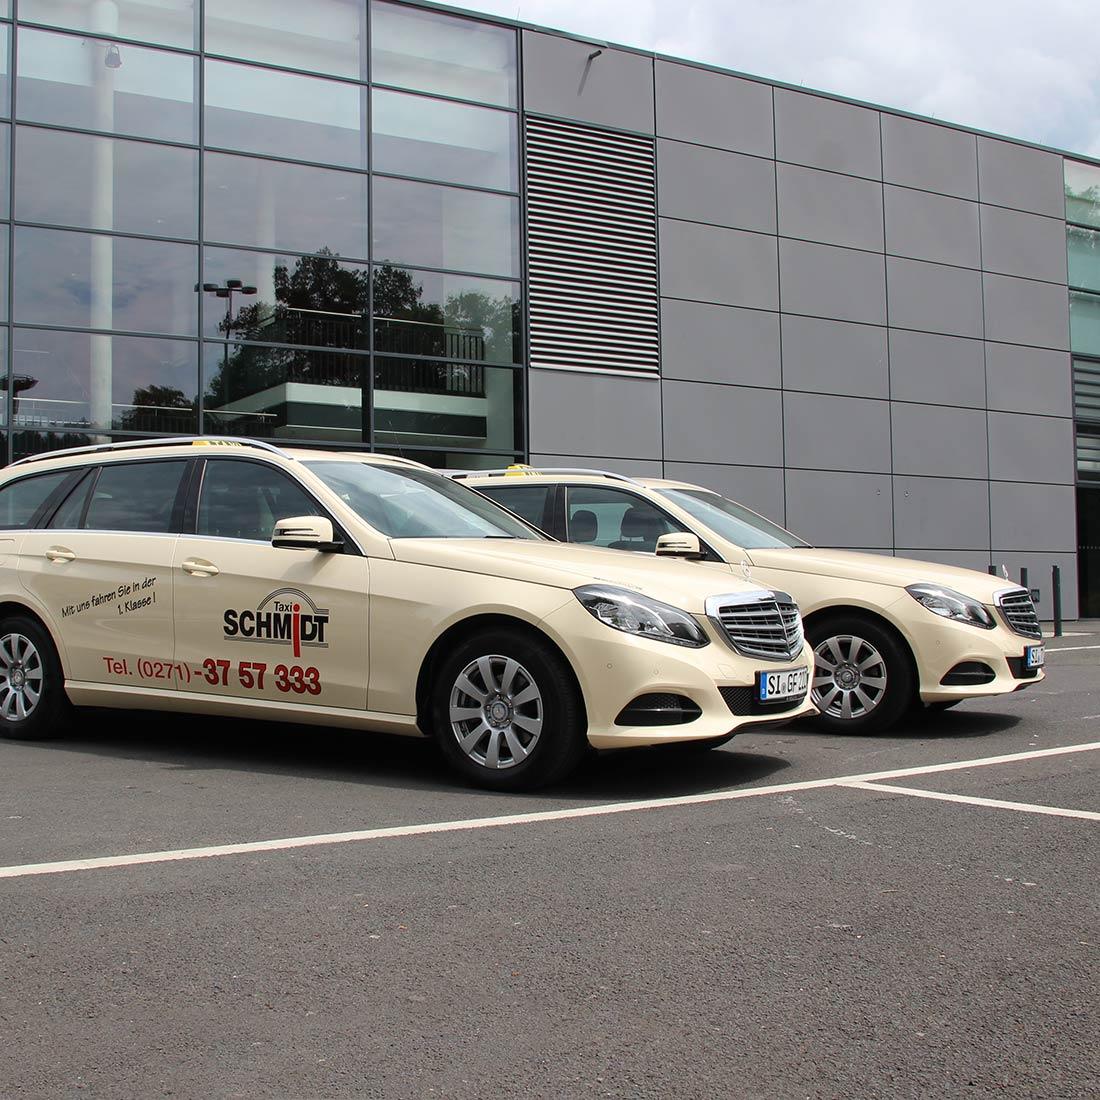 Taxi Schmidt GmbH